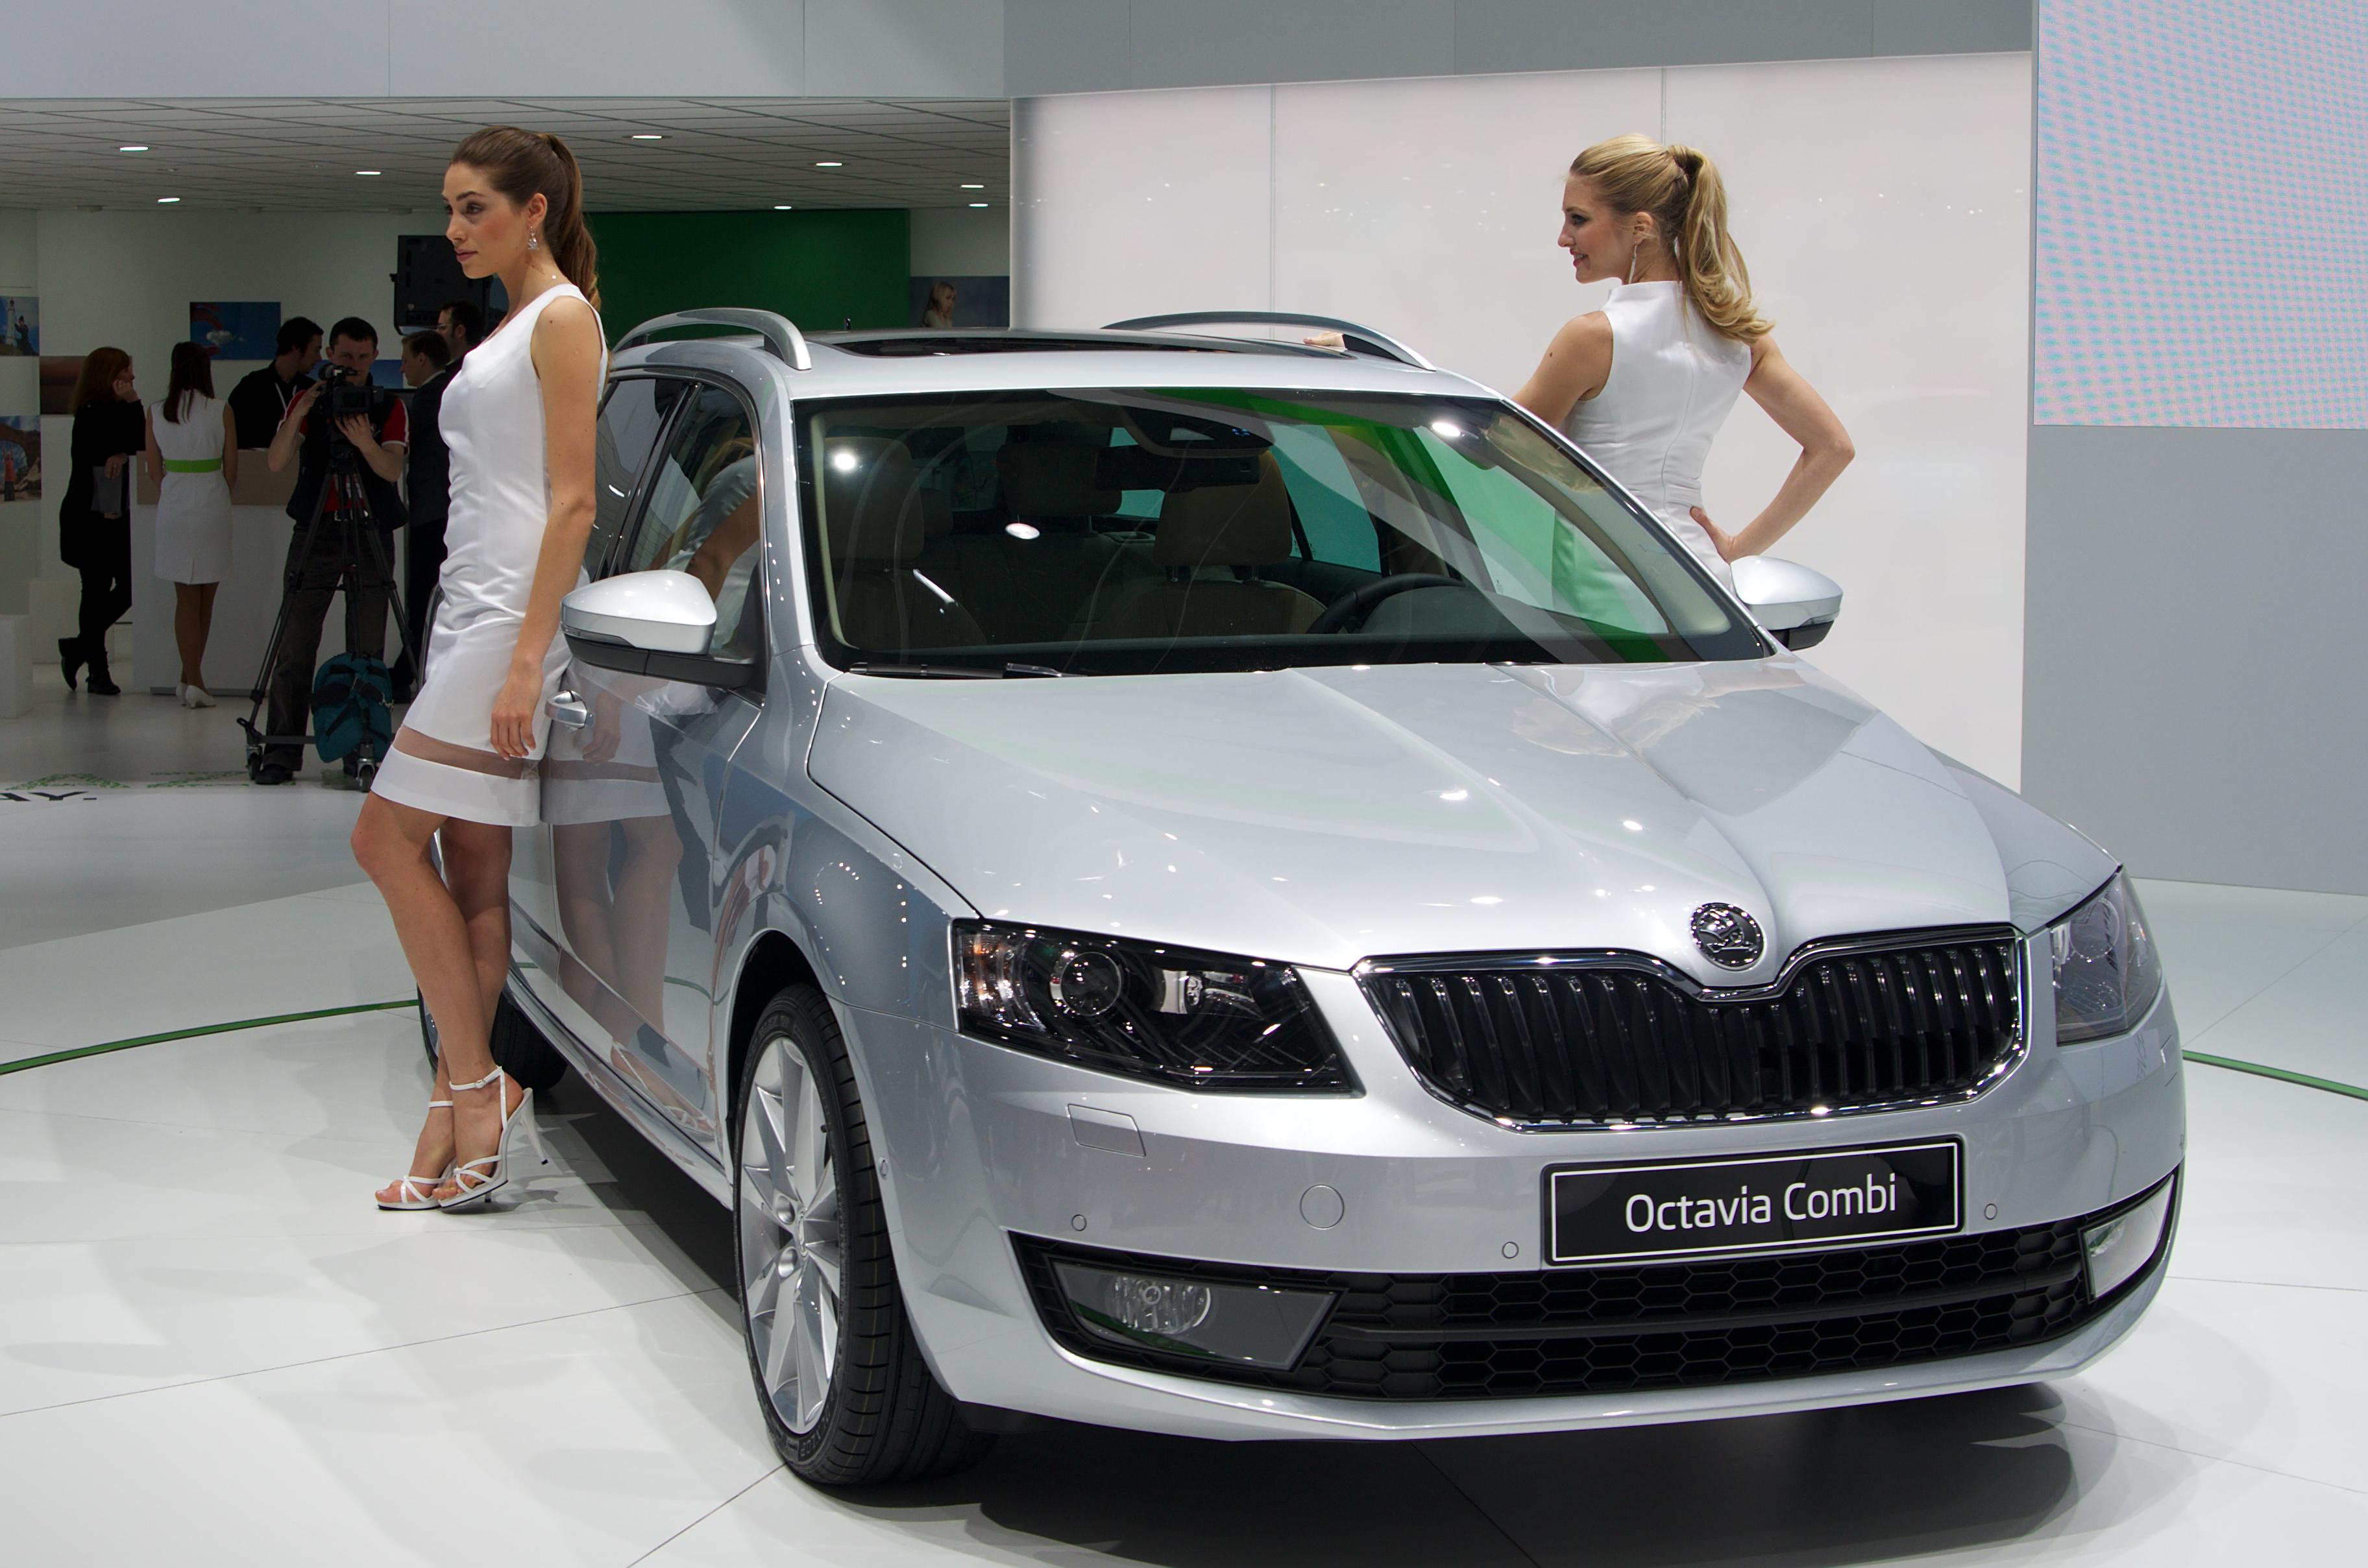 File:Geneva MotorShow 2013 - Skoda Octavia Combi grey.jpg ...